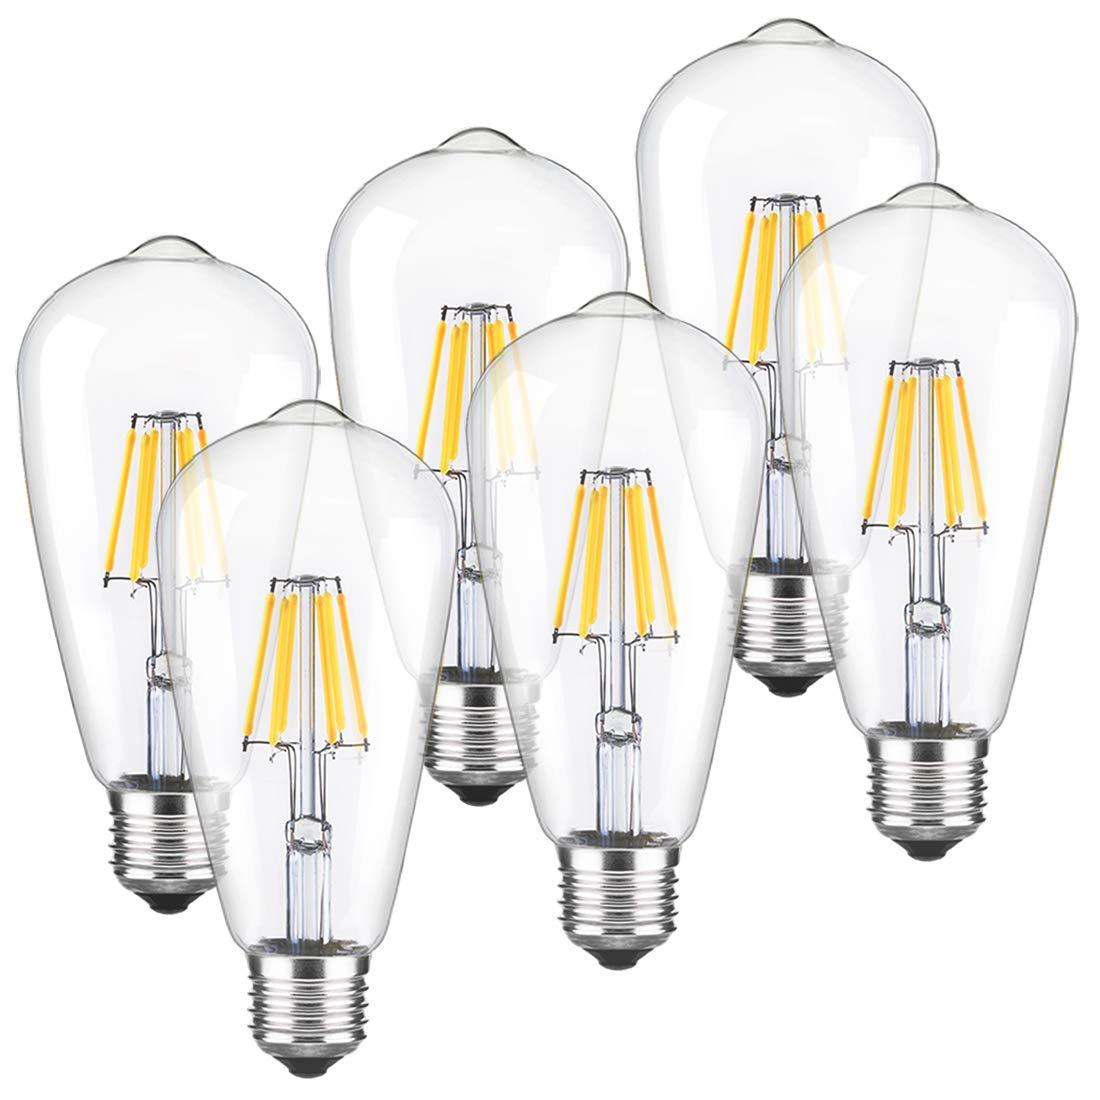 LED Edison Bulb Dimmable Vintage Light Bulbs 2700k Warm White 60W Equivalent E26 Edison Bulb 6-Pack by LUXON